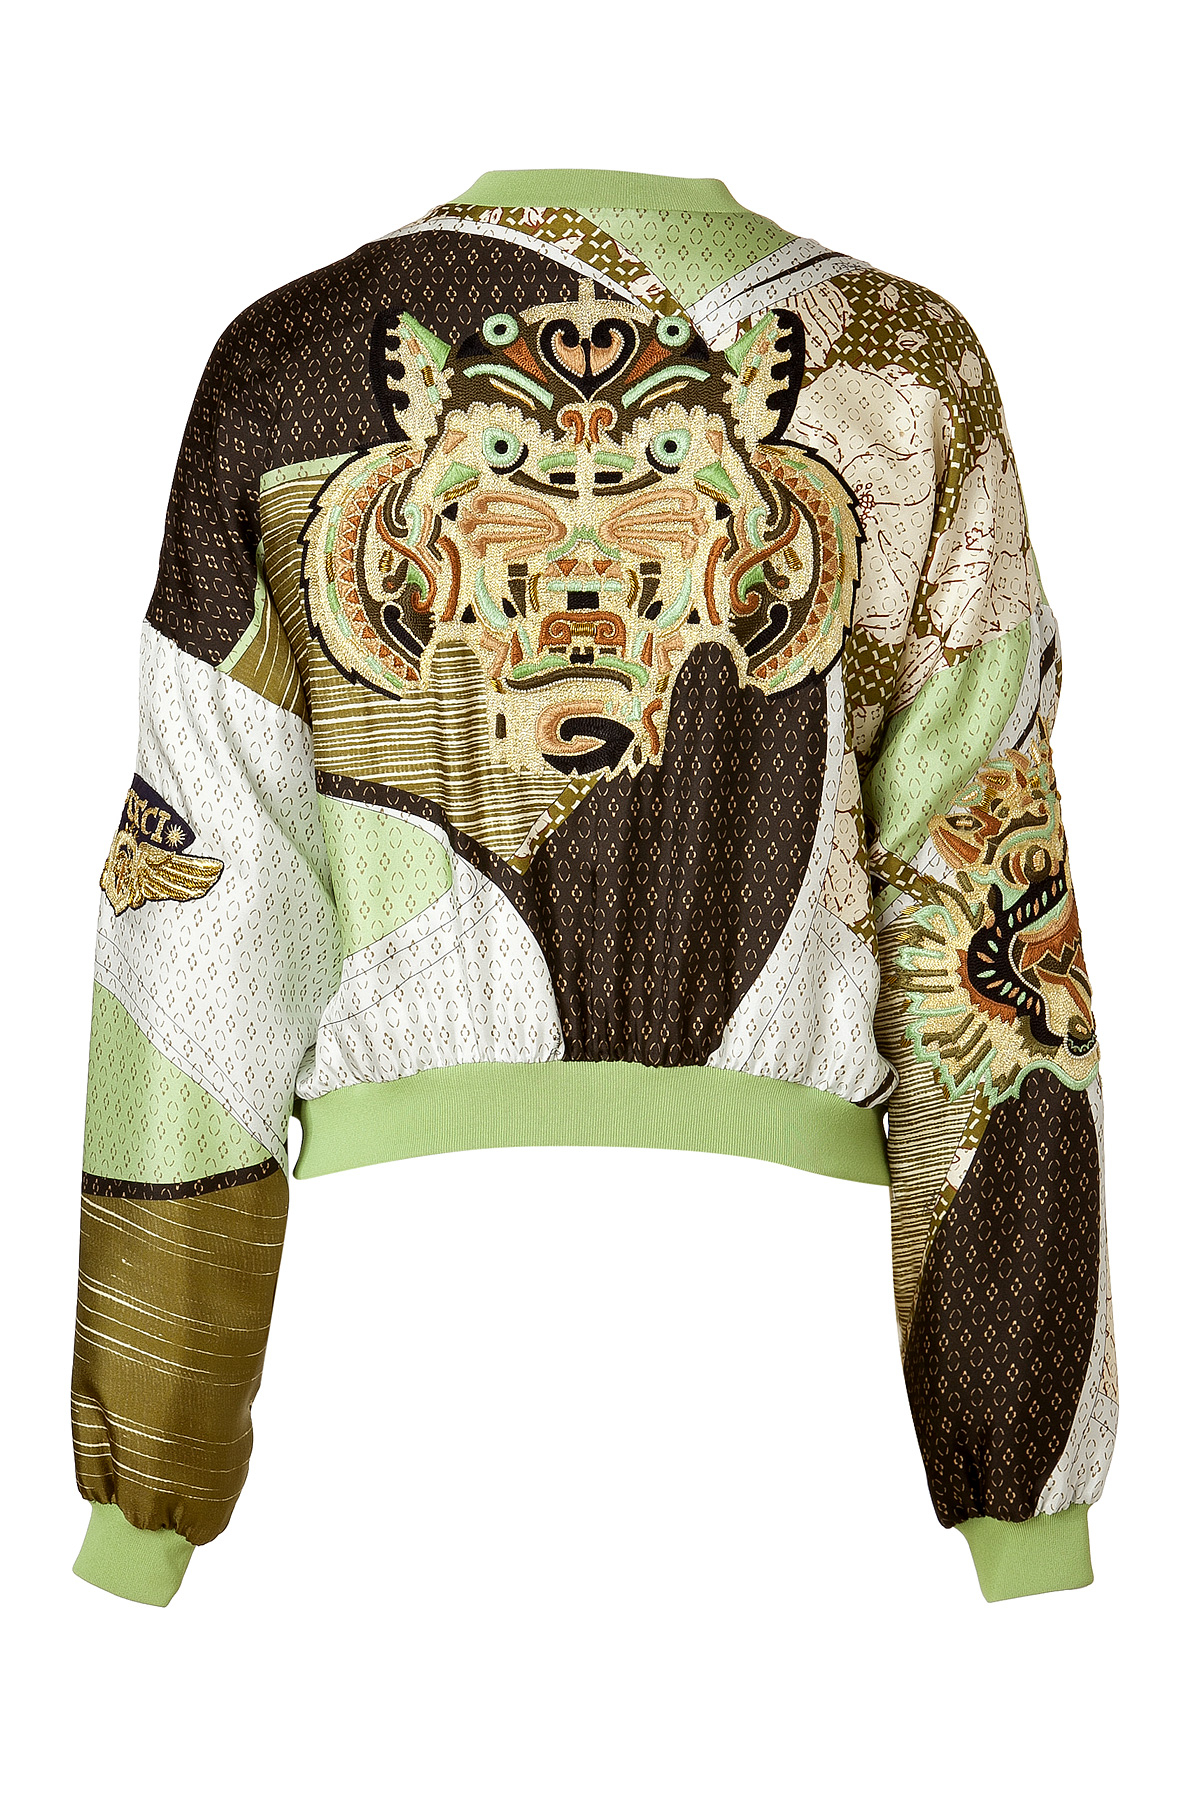 b76f65eaffd4 Lyst - Emilio Pucci Applegoldmulti Embroidered Silk Bomber Jacket in ...